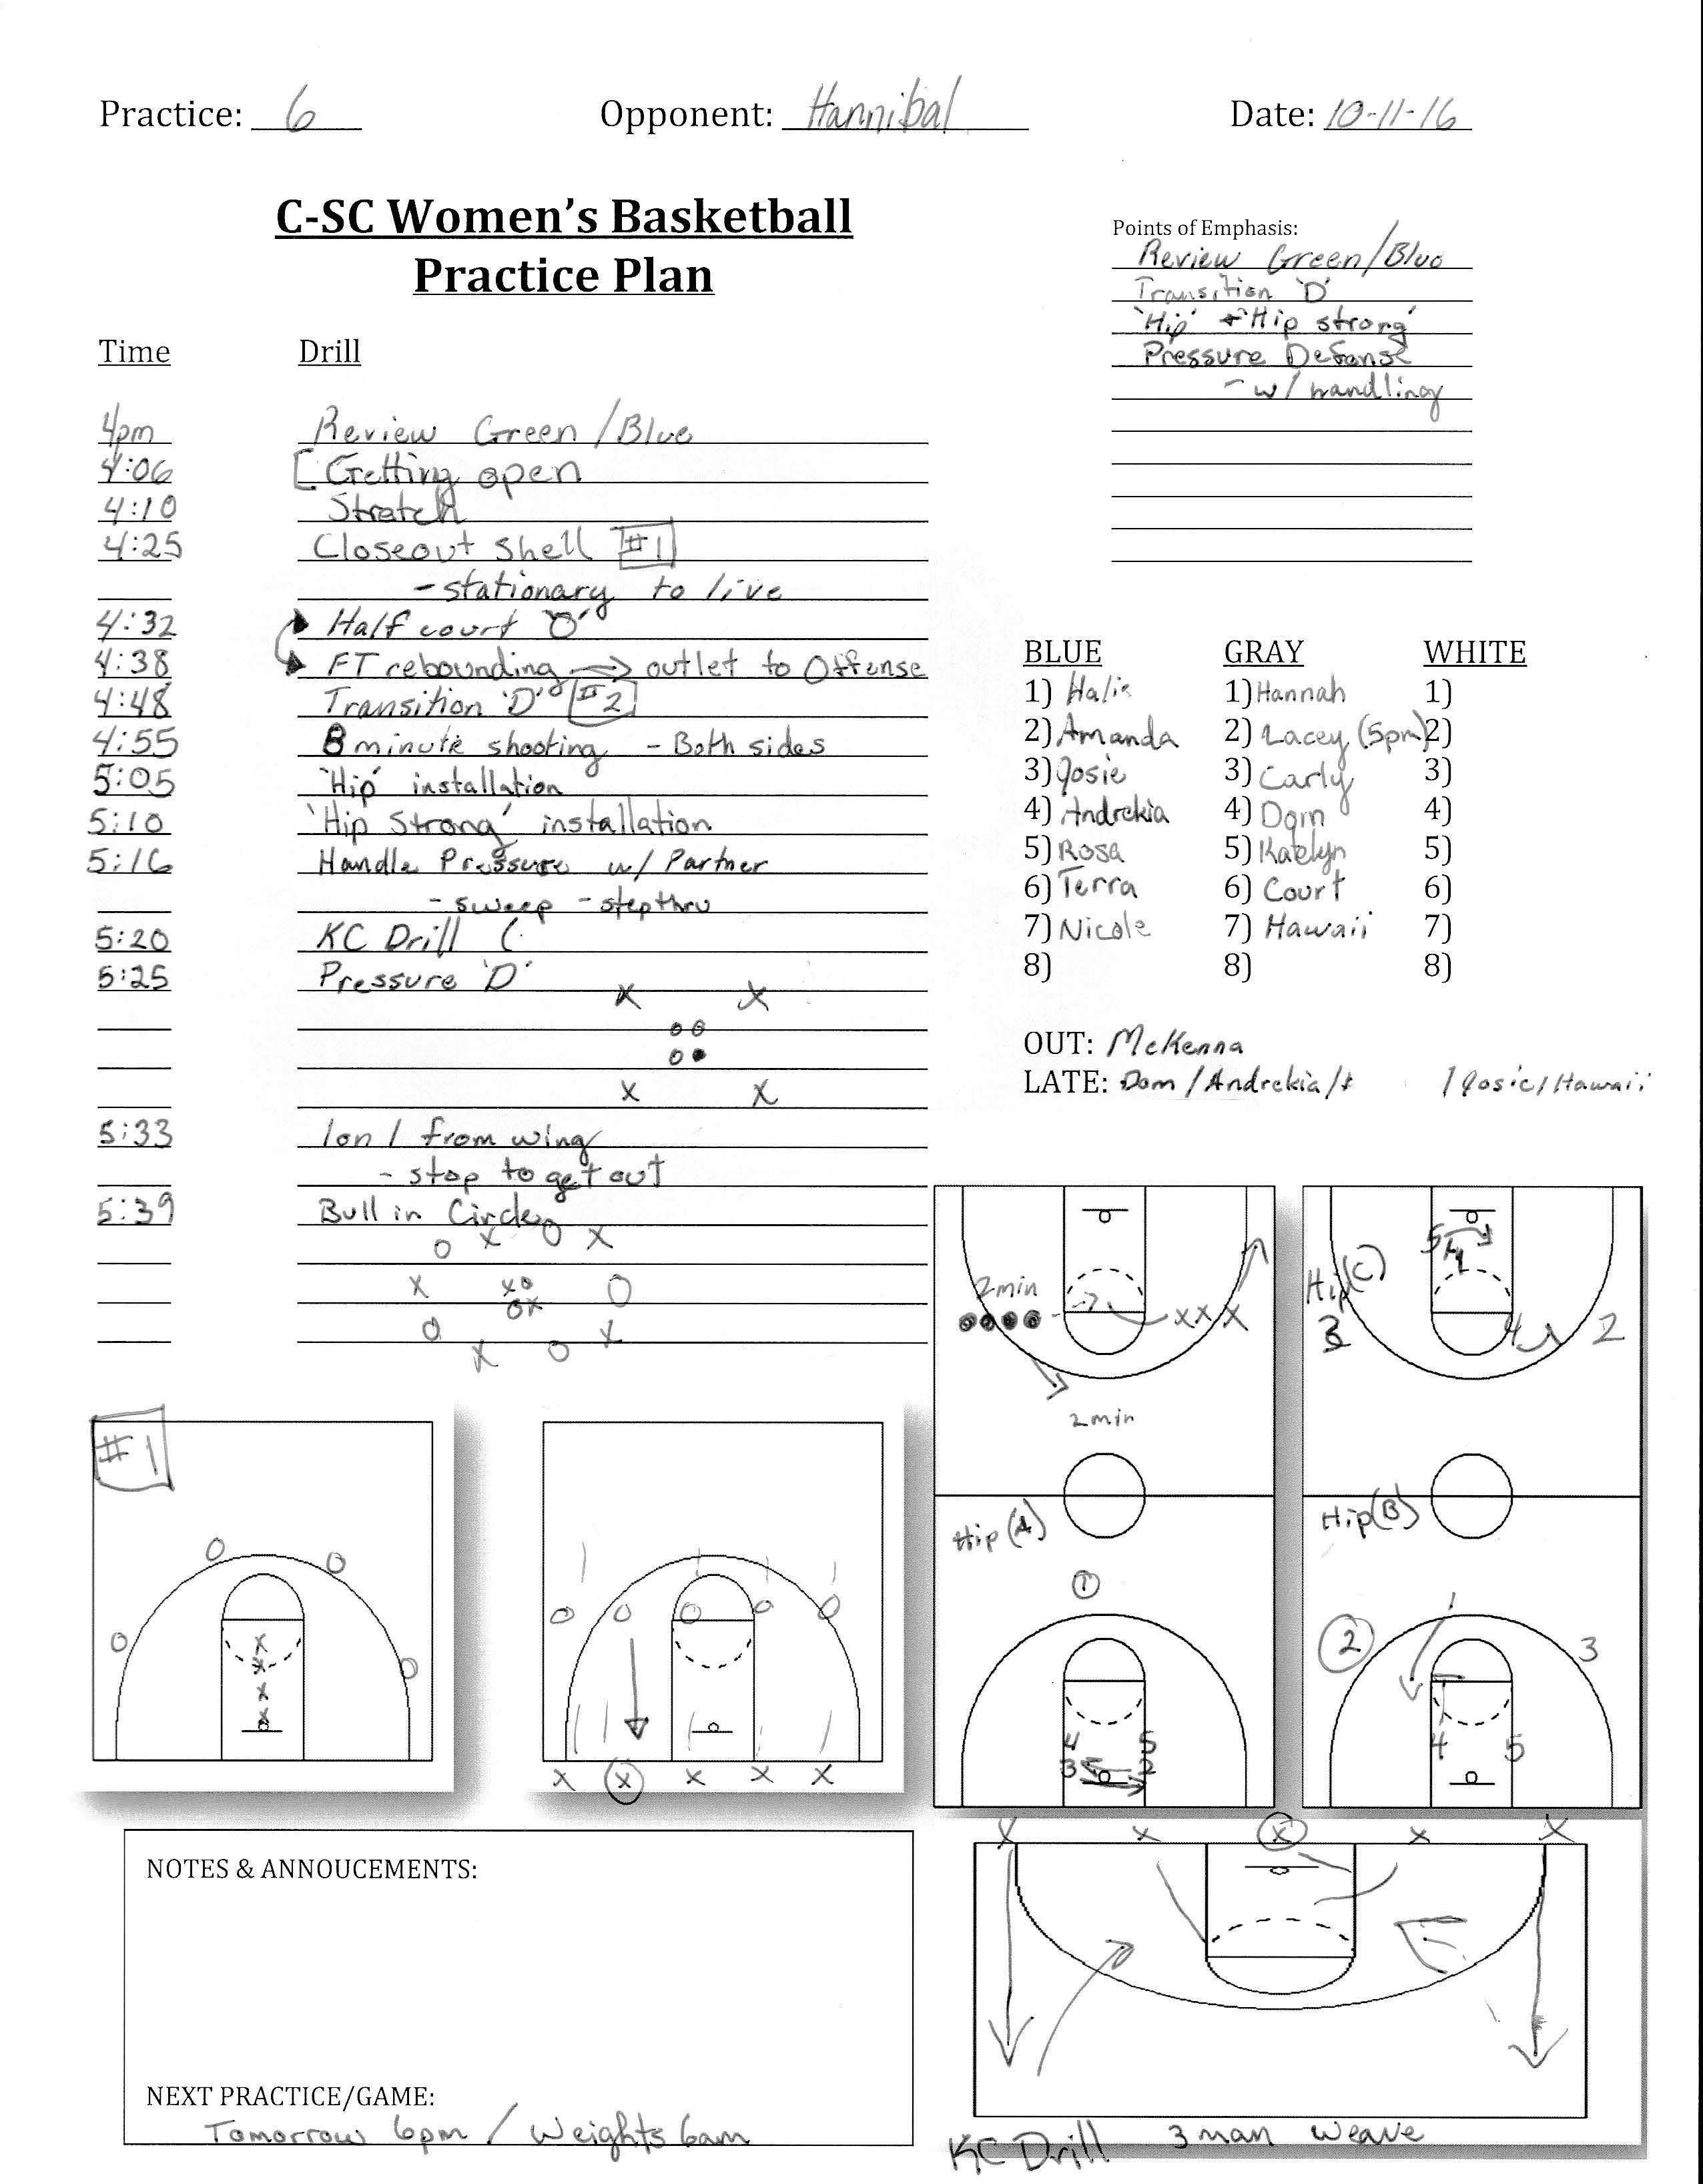 005 Beautiful Basketball Practice Plan Template Image  Pdf Fillable Google DocFull